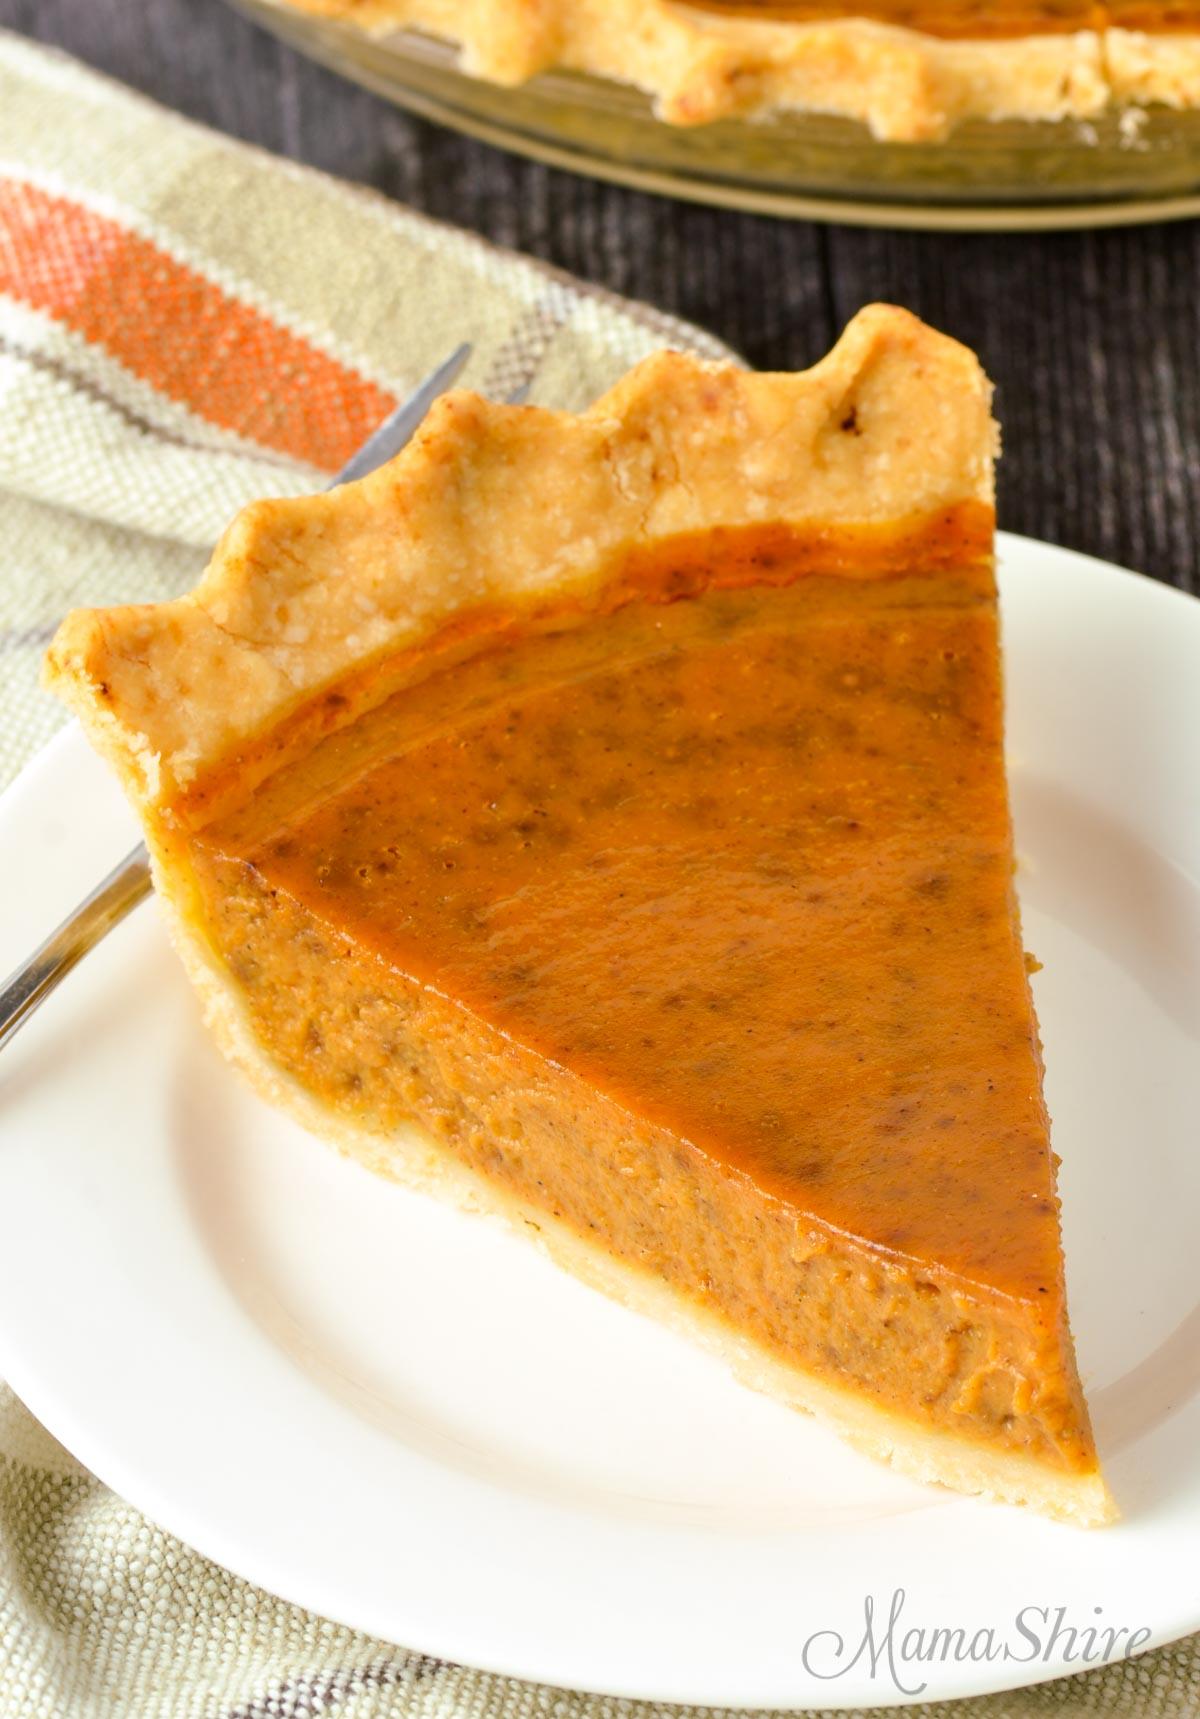 A slice of gluten-free pumpkin pie on a white plate.